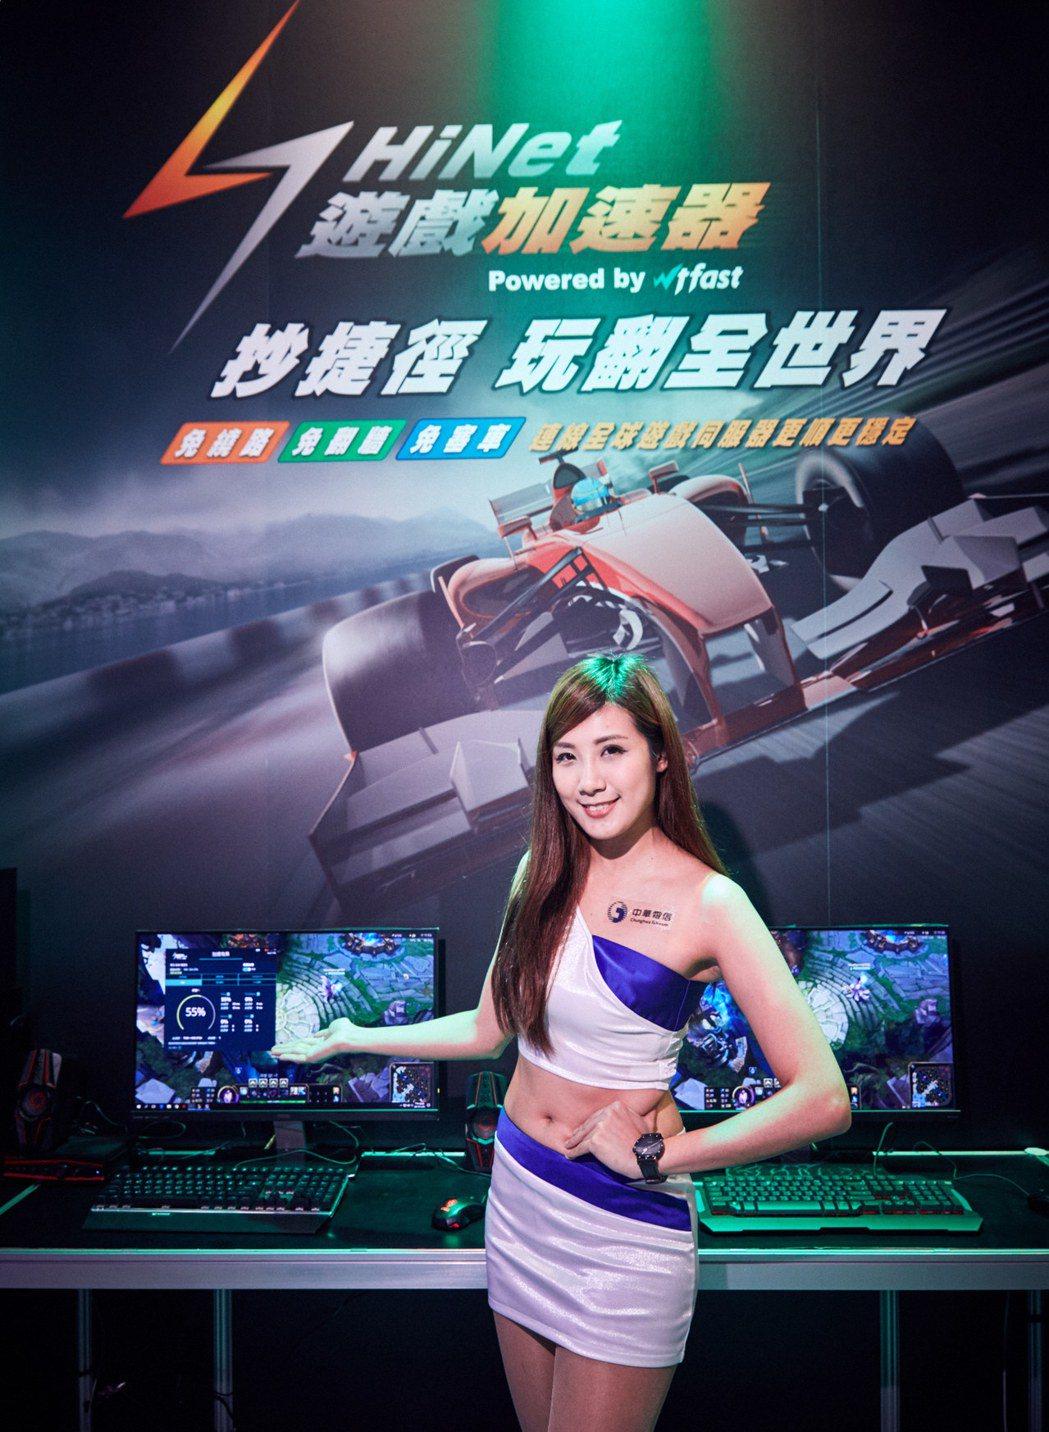 HiNet遊戲加速器確保玩家連線至國外時能沿著最佳路徑,減少打Game時延遲狀況...